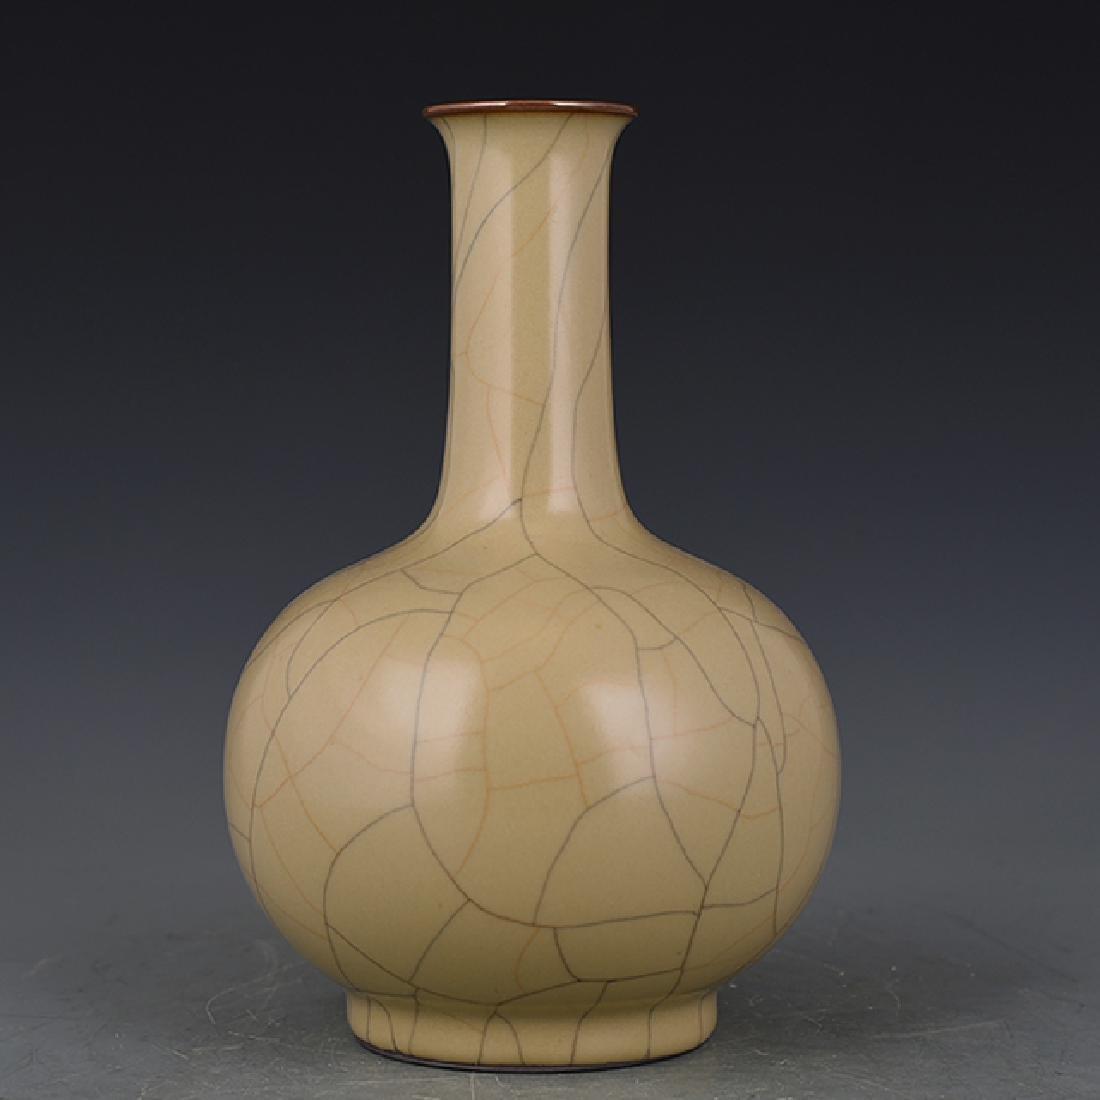 Chinese Guan Ware Vase